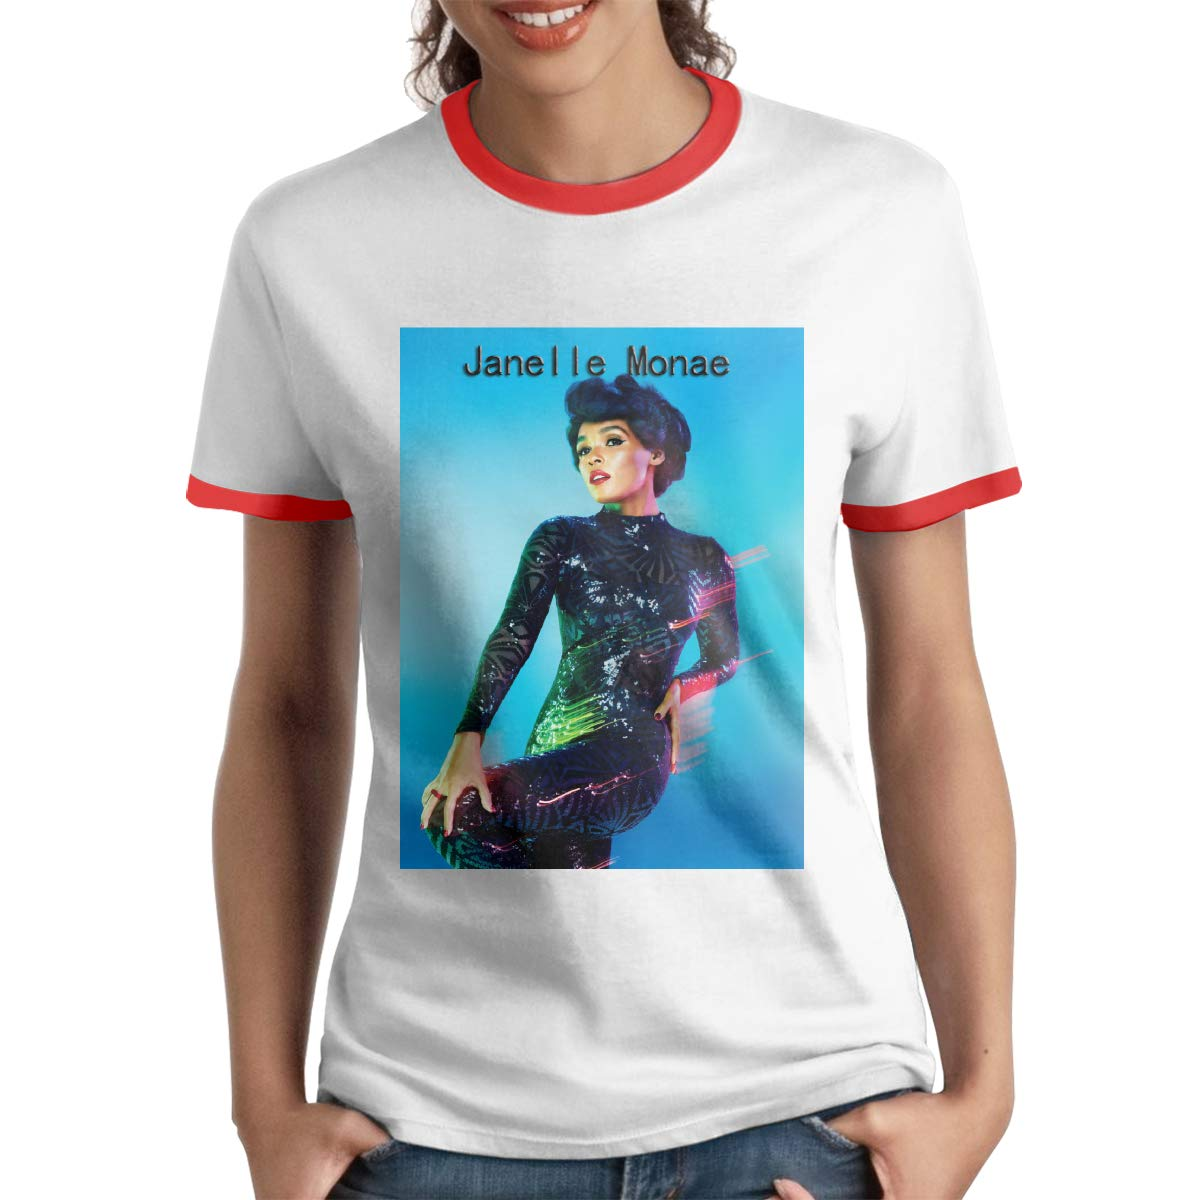 Scattering Womans Janelle Monae Unique St.Valentines Day Gift Regular Shirt